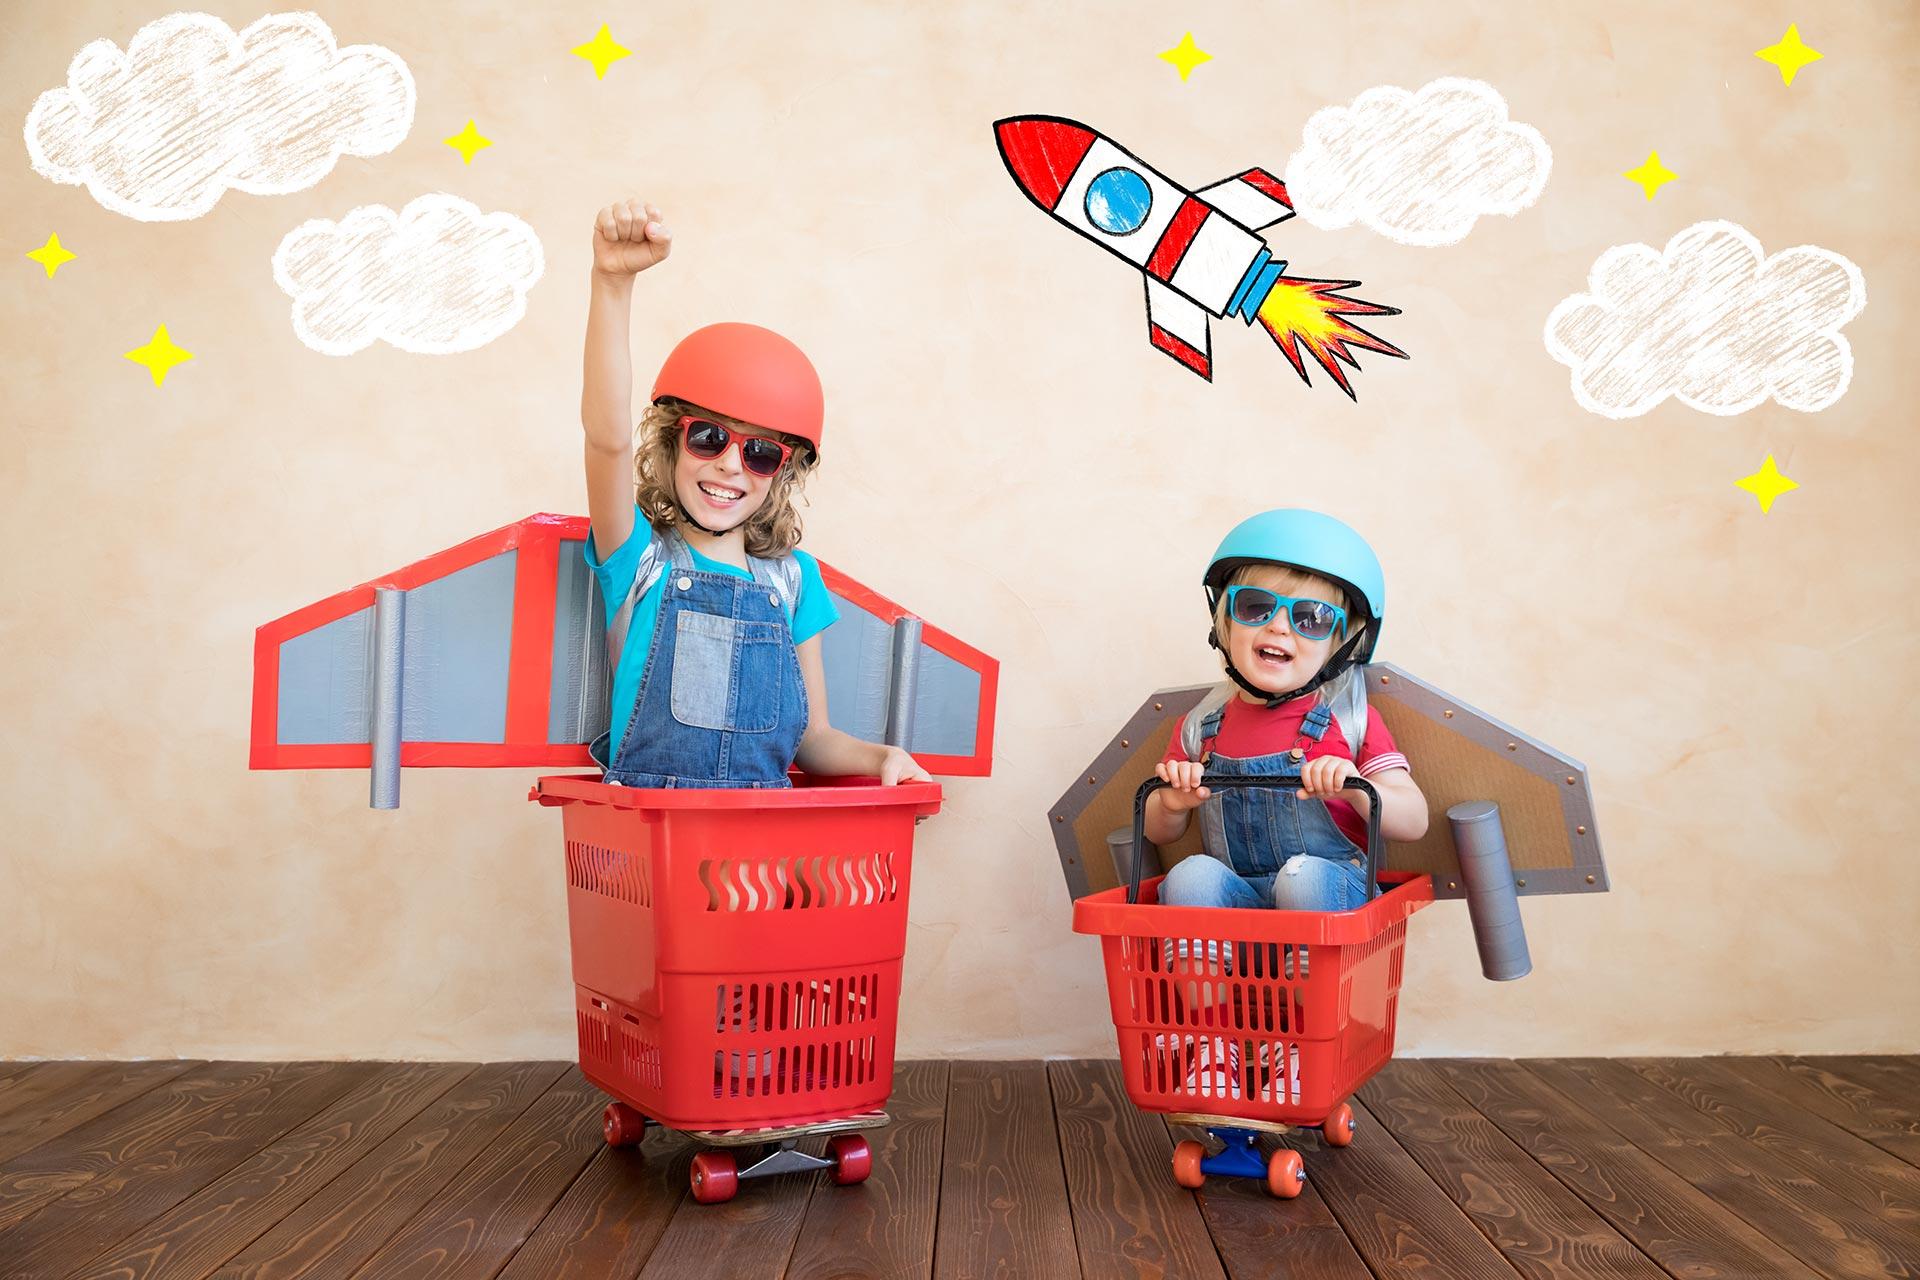 ricosta pepino kinderschuhe onlineshop relaunch E-Commerce Multichannel System